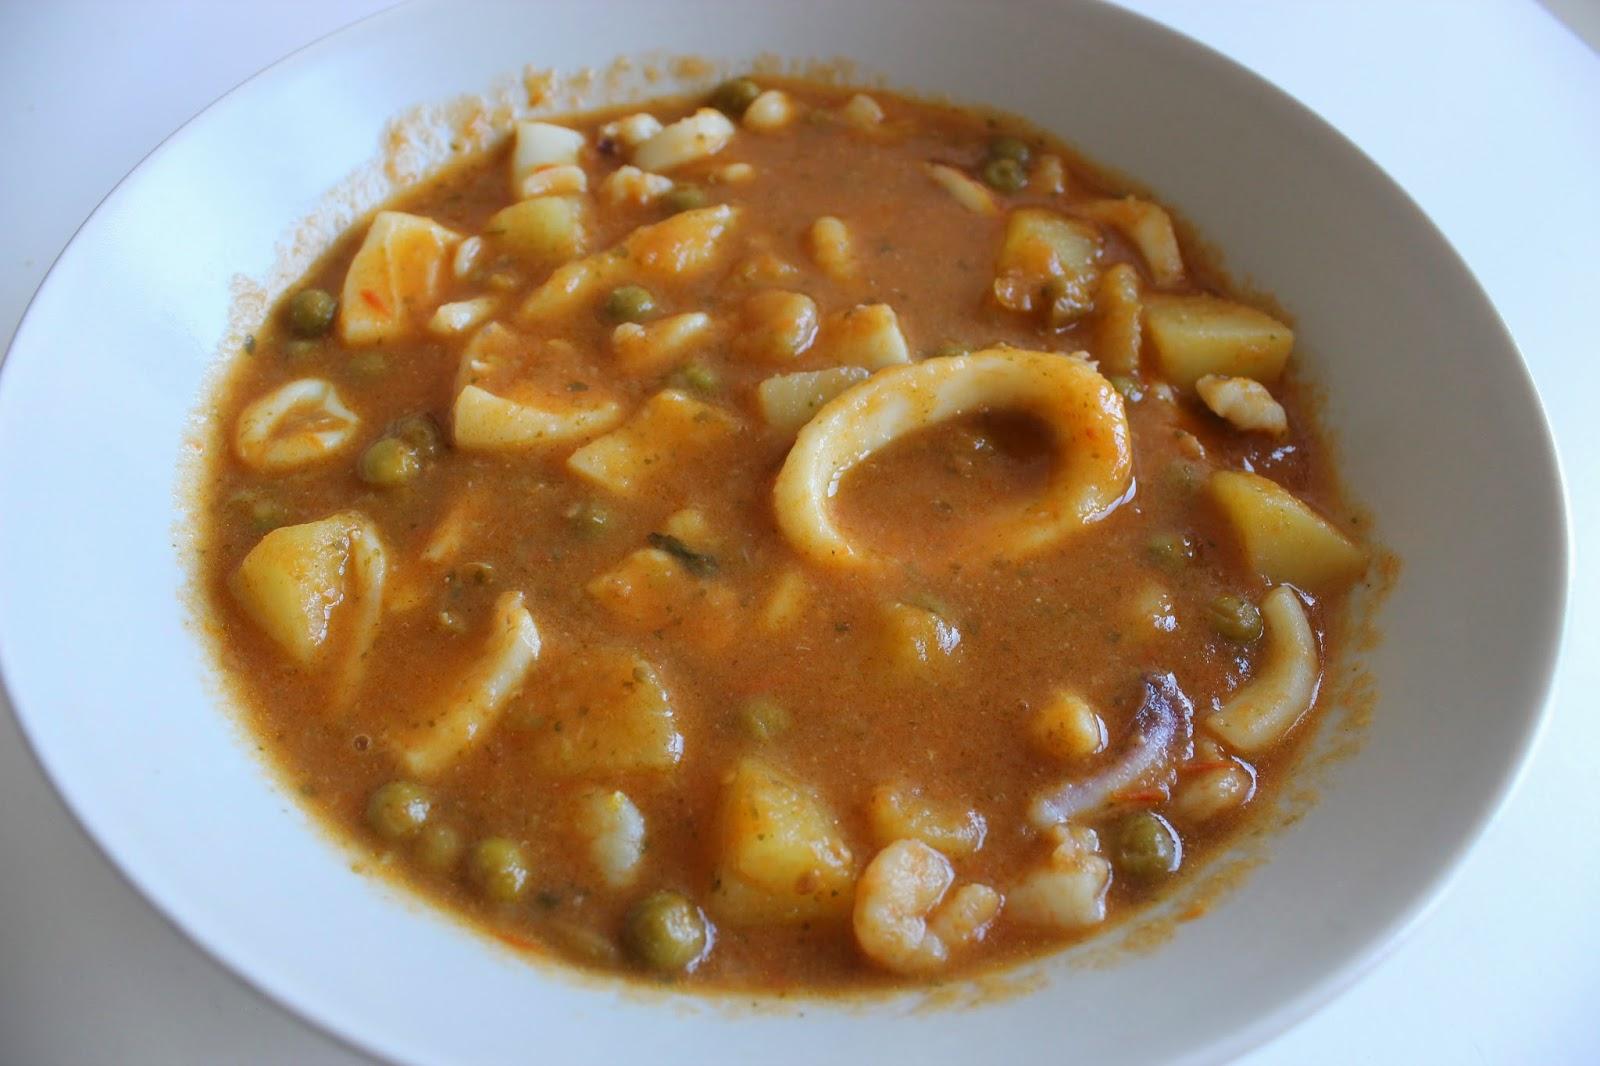 El ba l de monique caldereta de sepia y calamar - Caldereta de langostinos ...